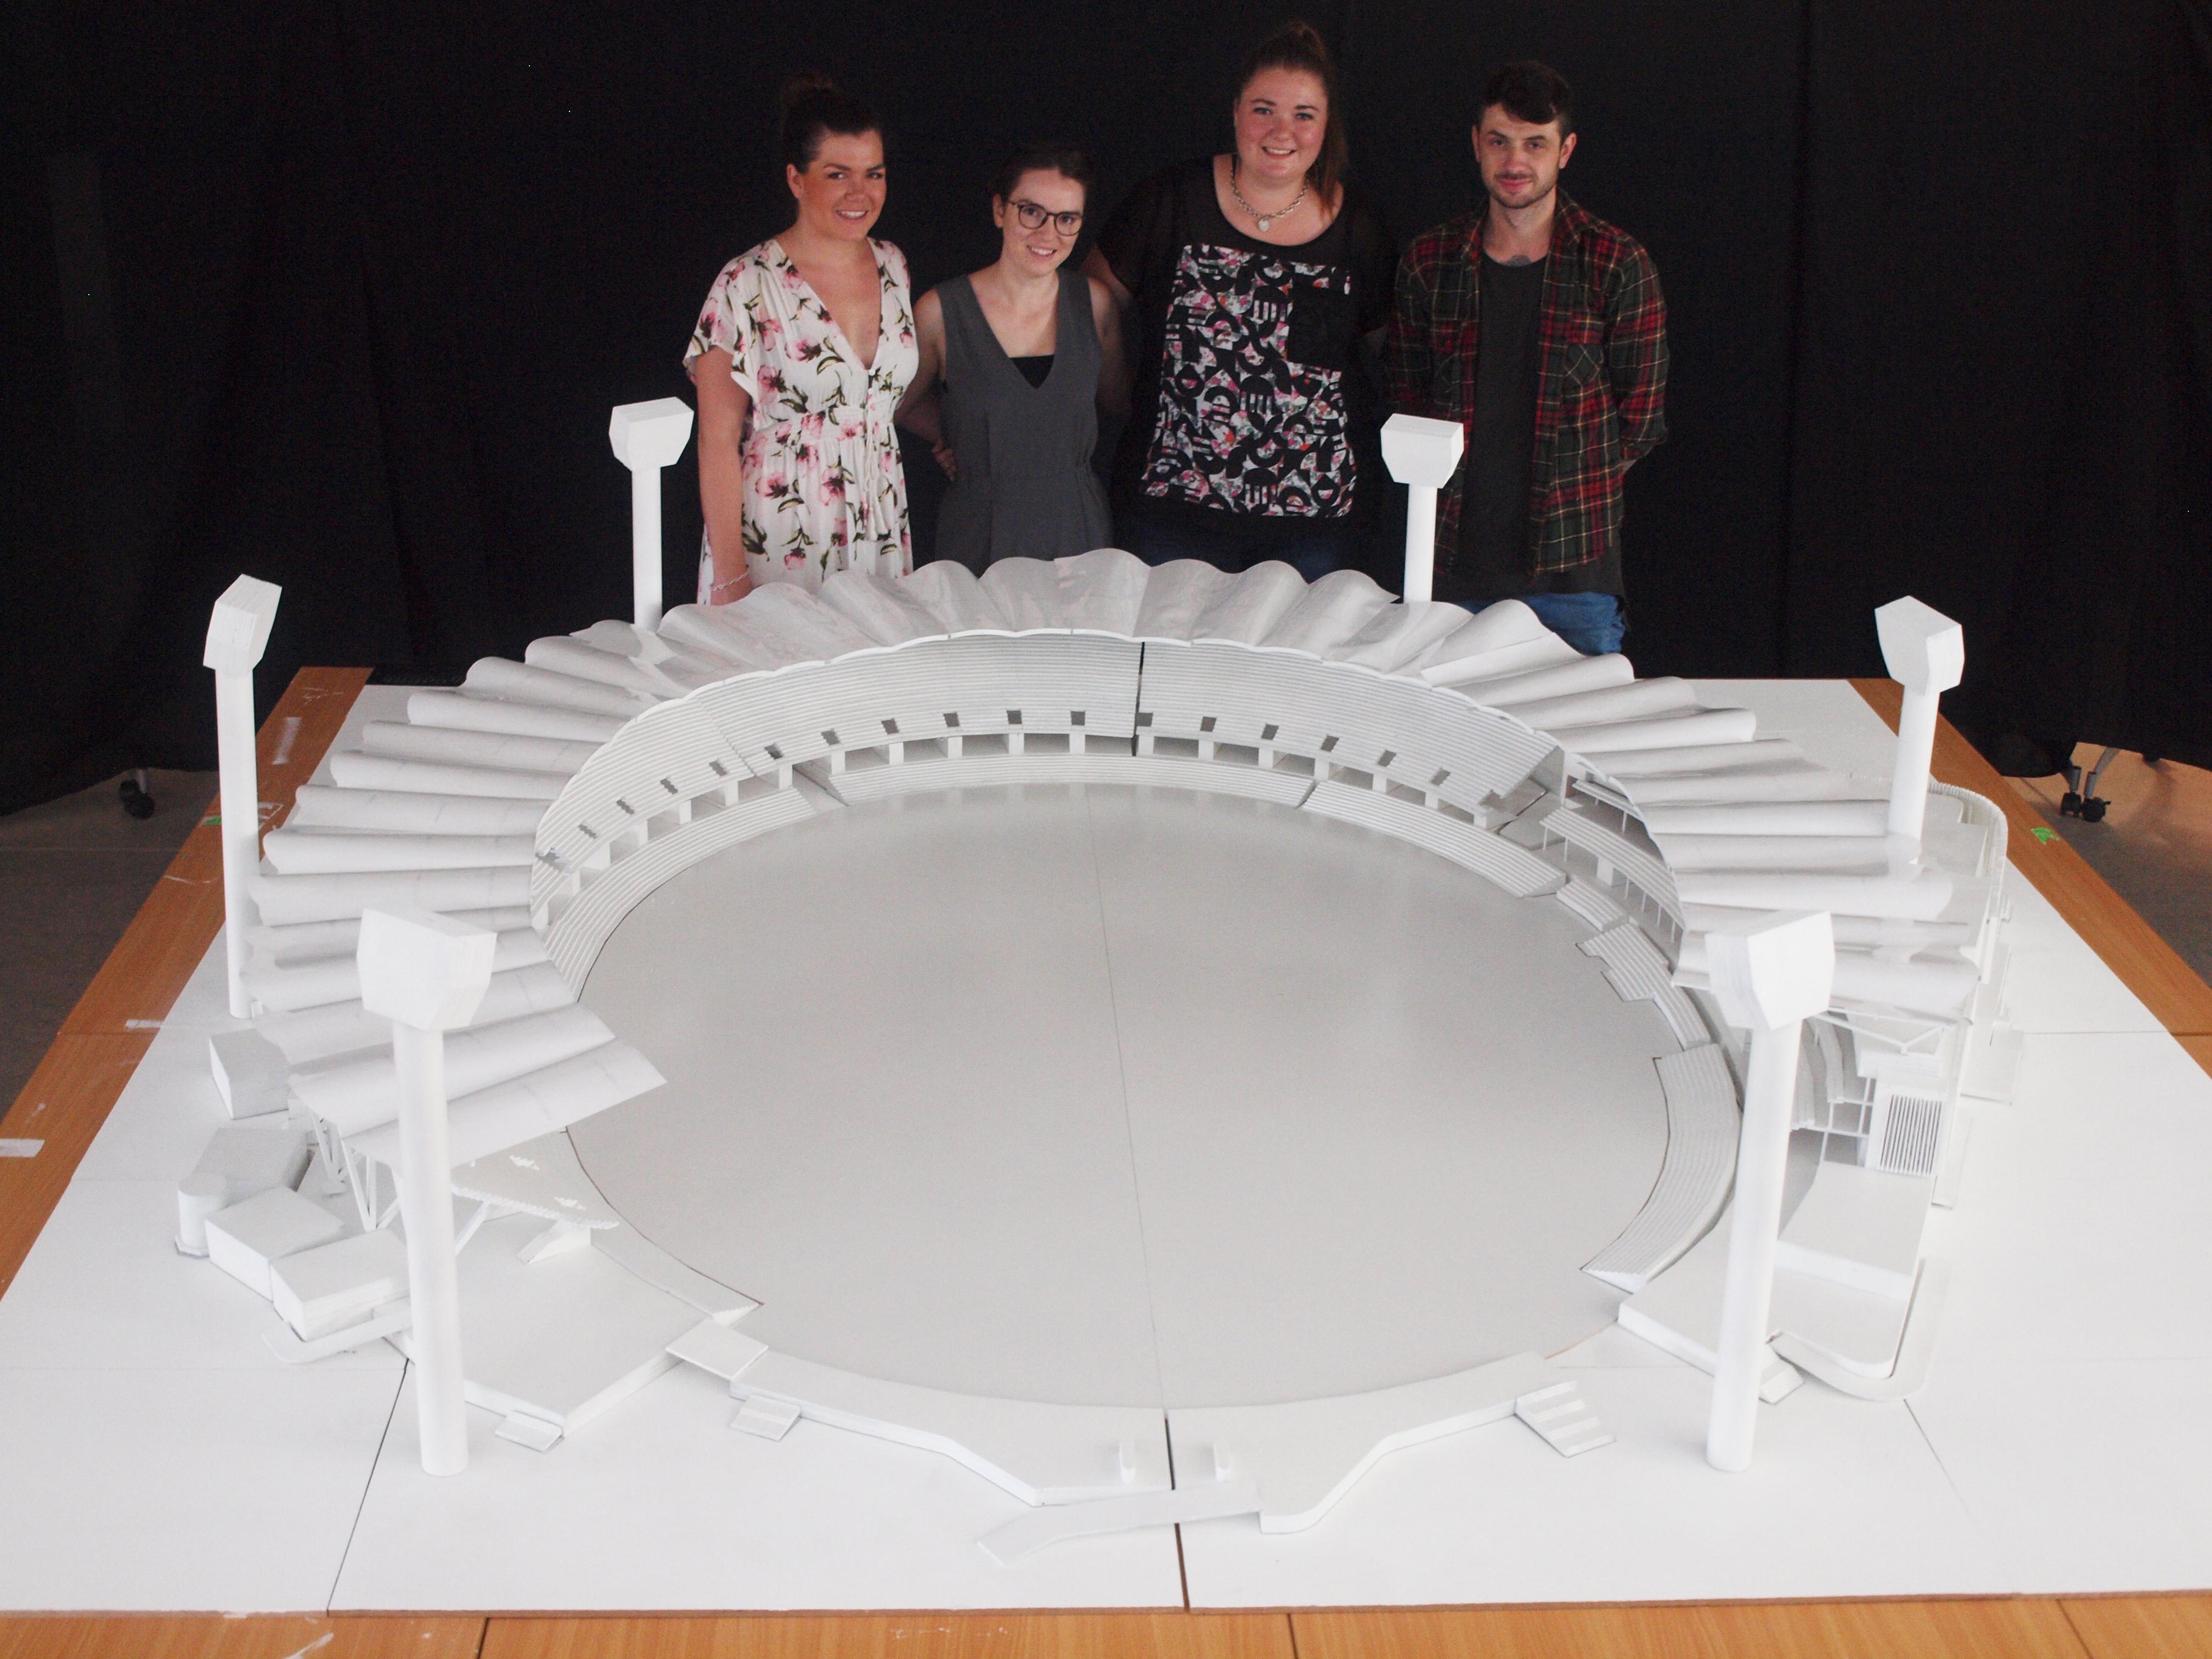 Architecture students Nikki Findlay, Sarah Paige, Kirra Keating, Brian Mates with the Carrara Stadium model.